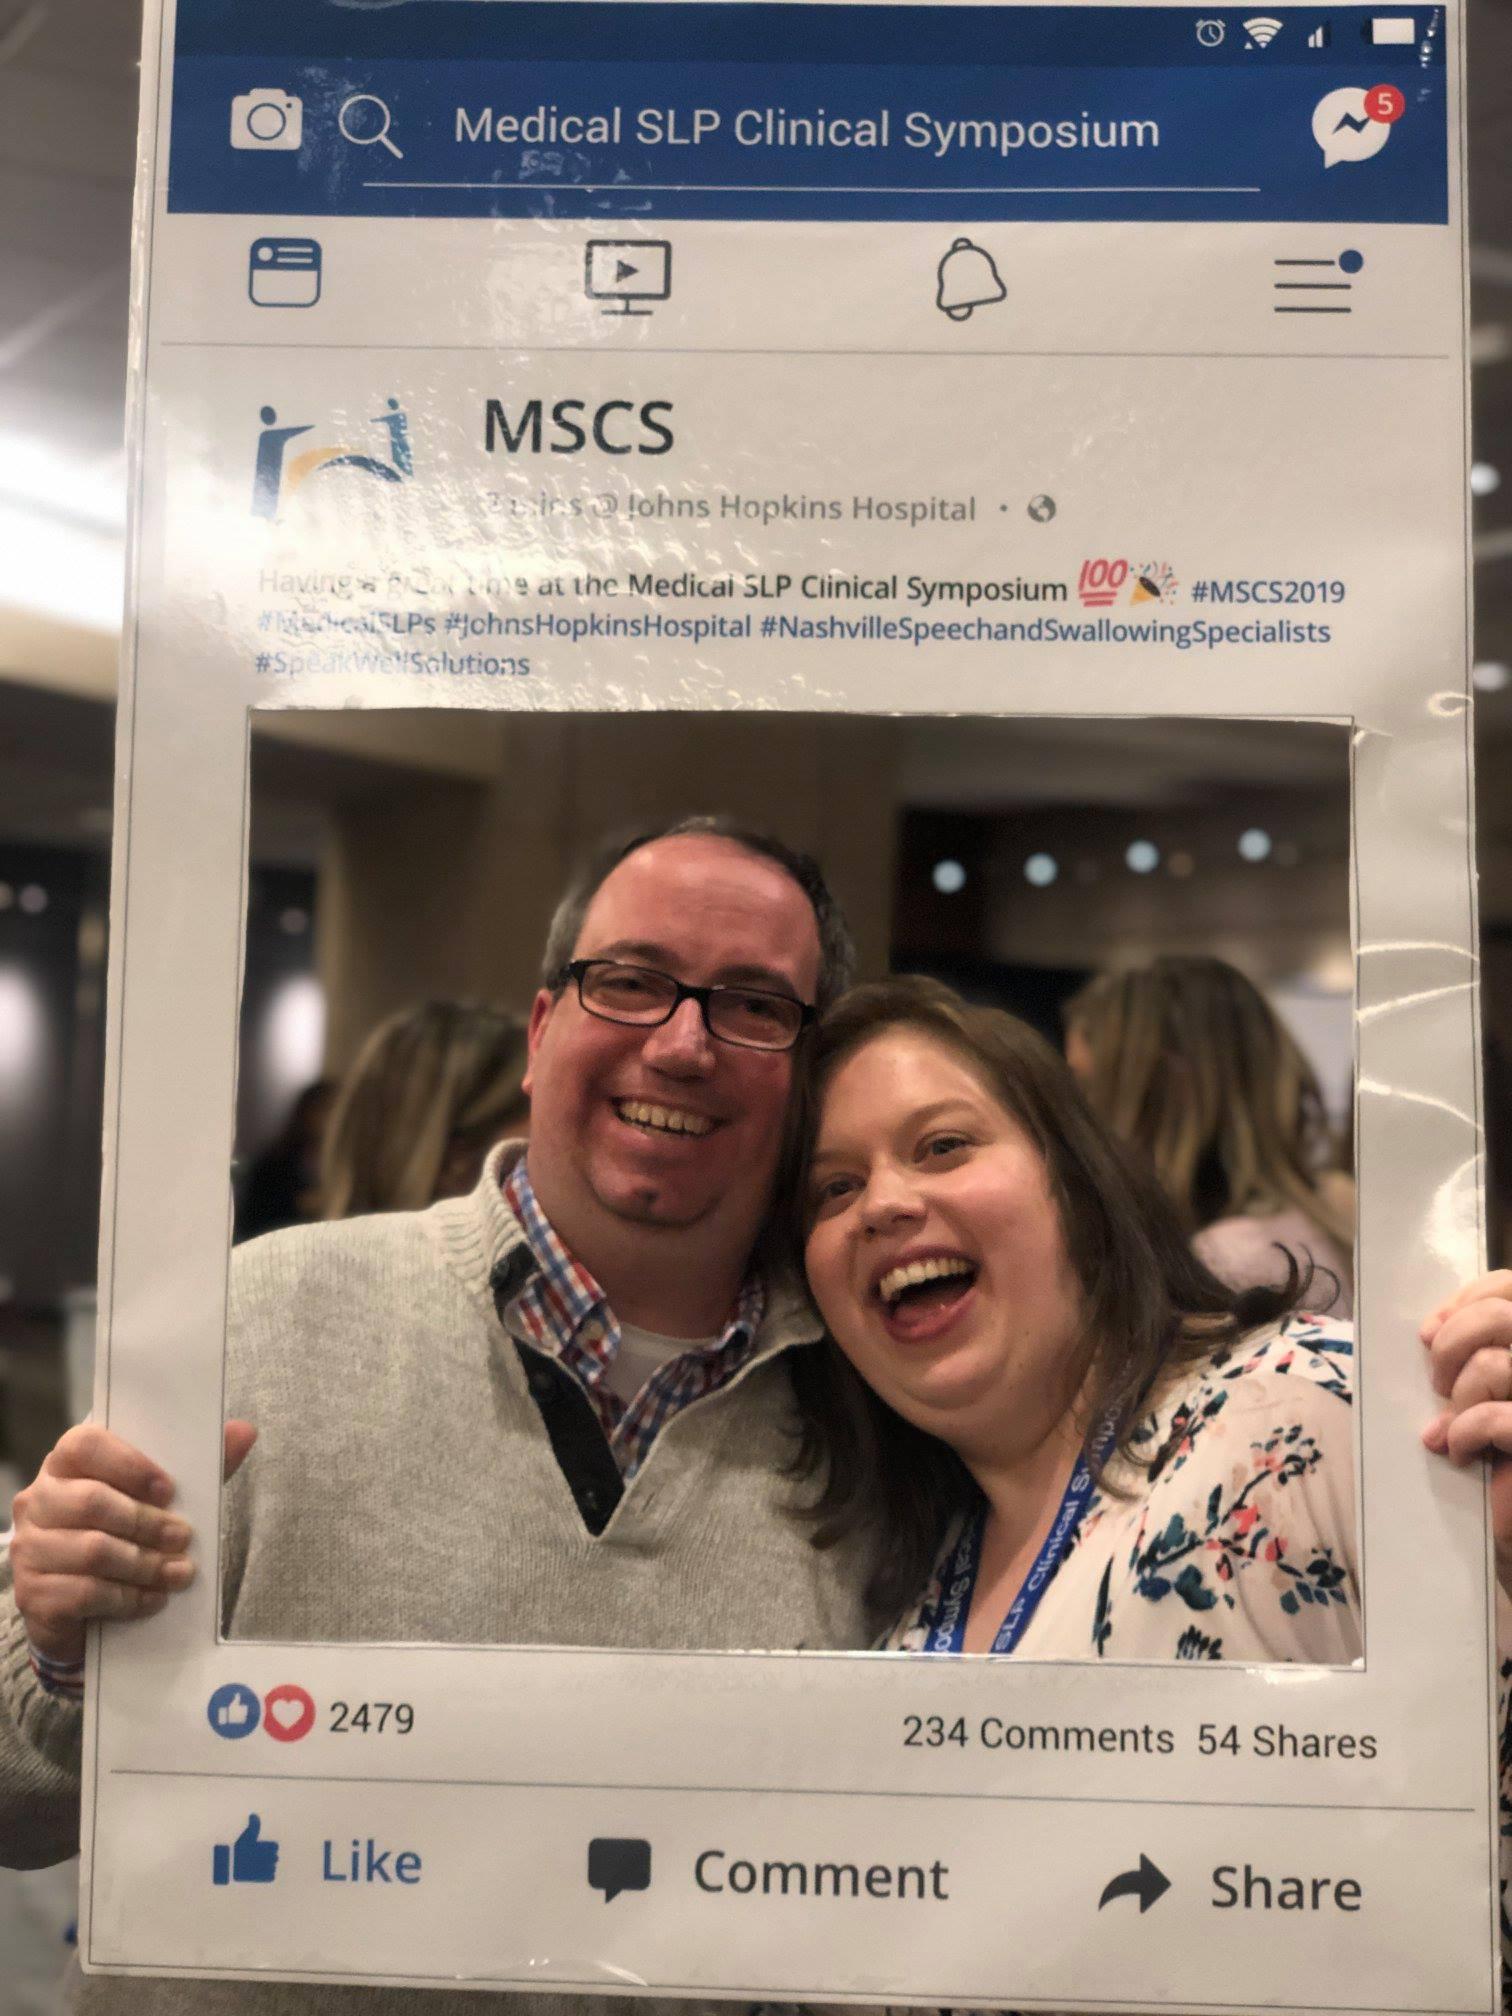 Medical SLP Clinical Symposium — Nashville Speech